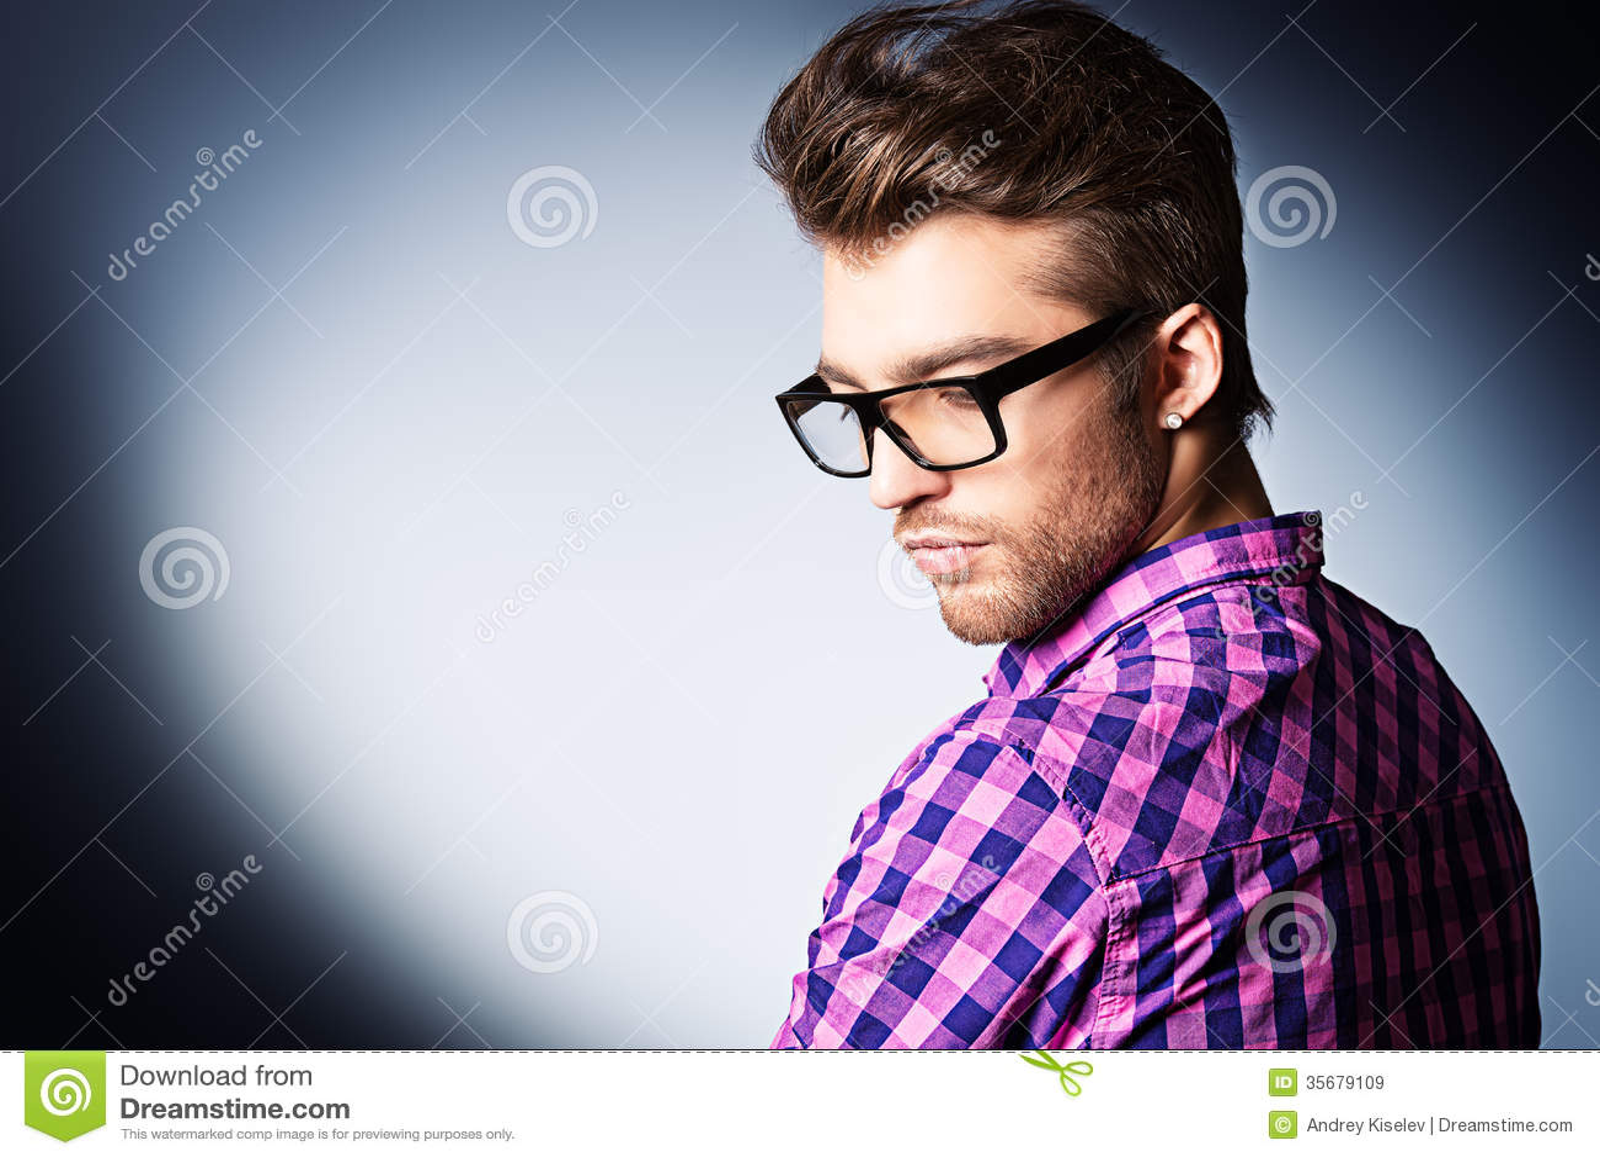 eyewear direct  eyewear